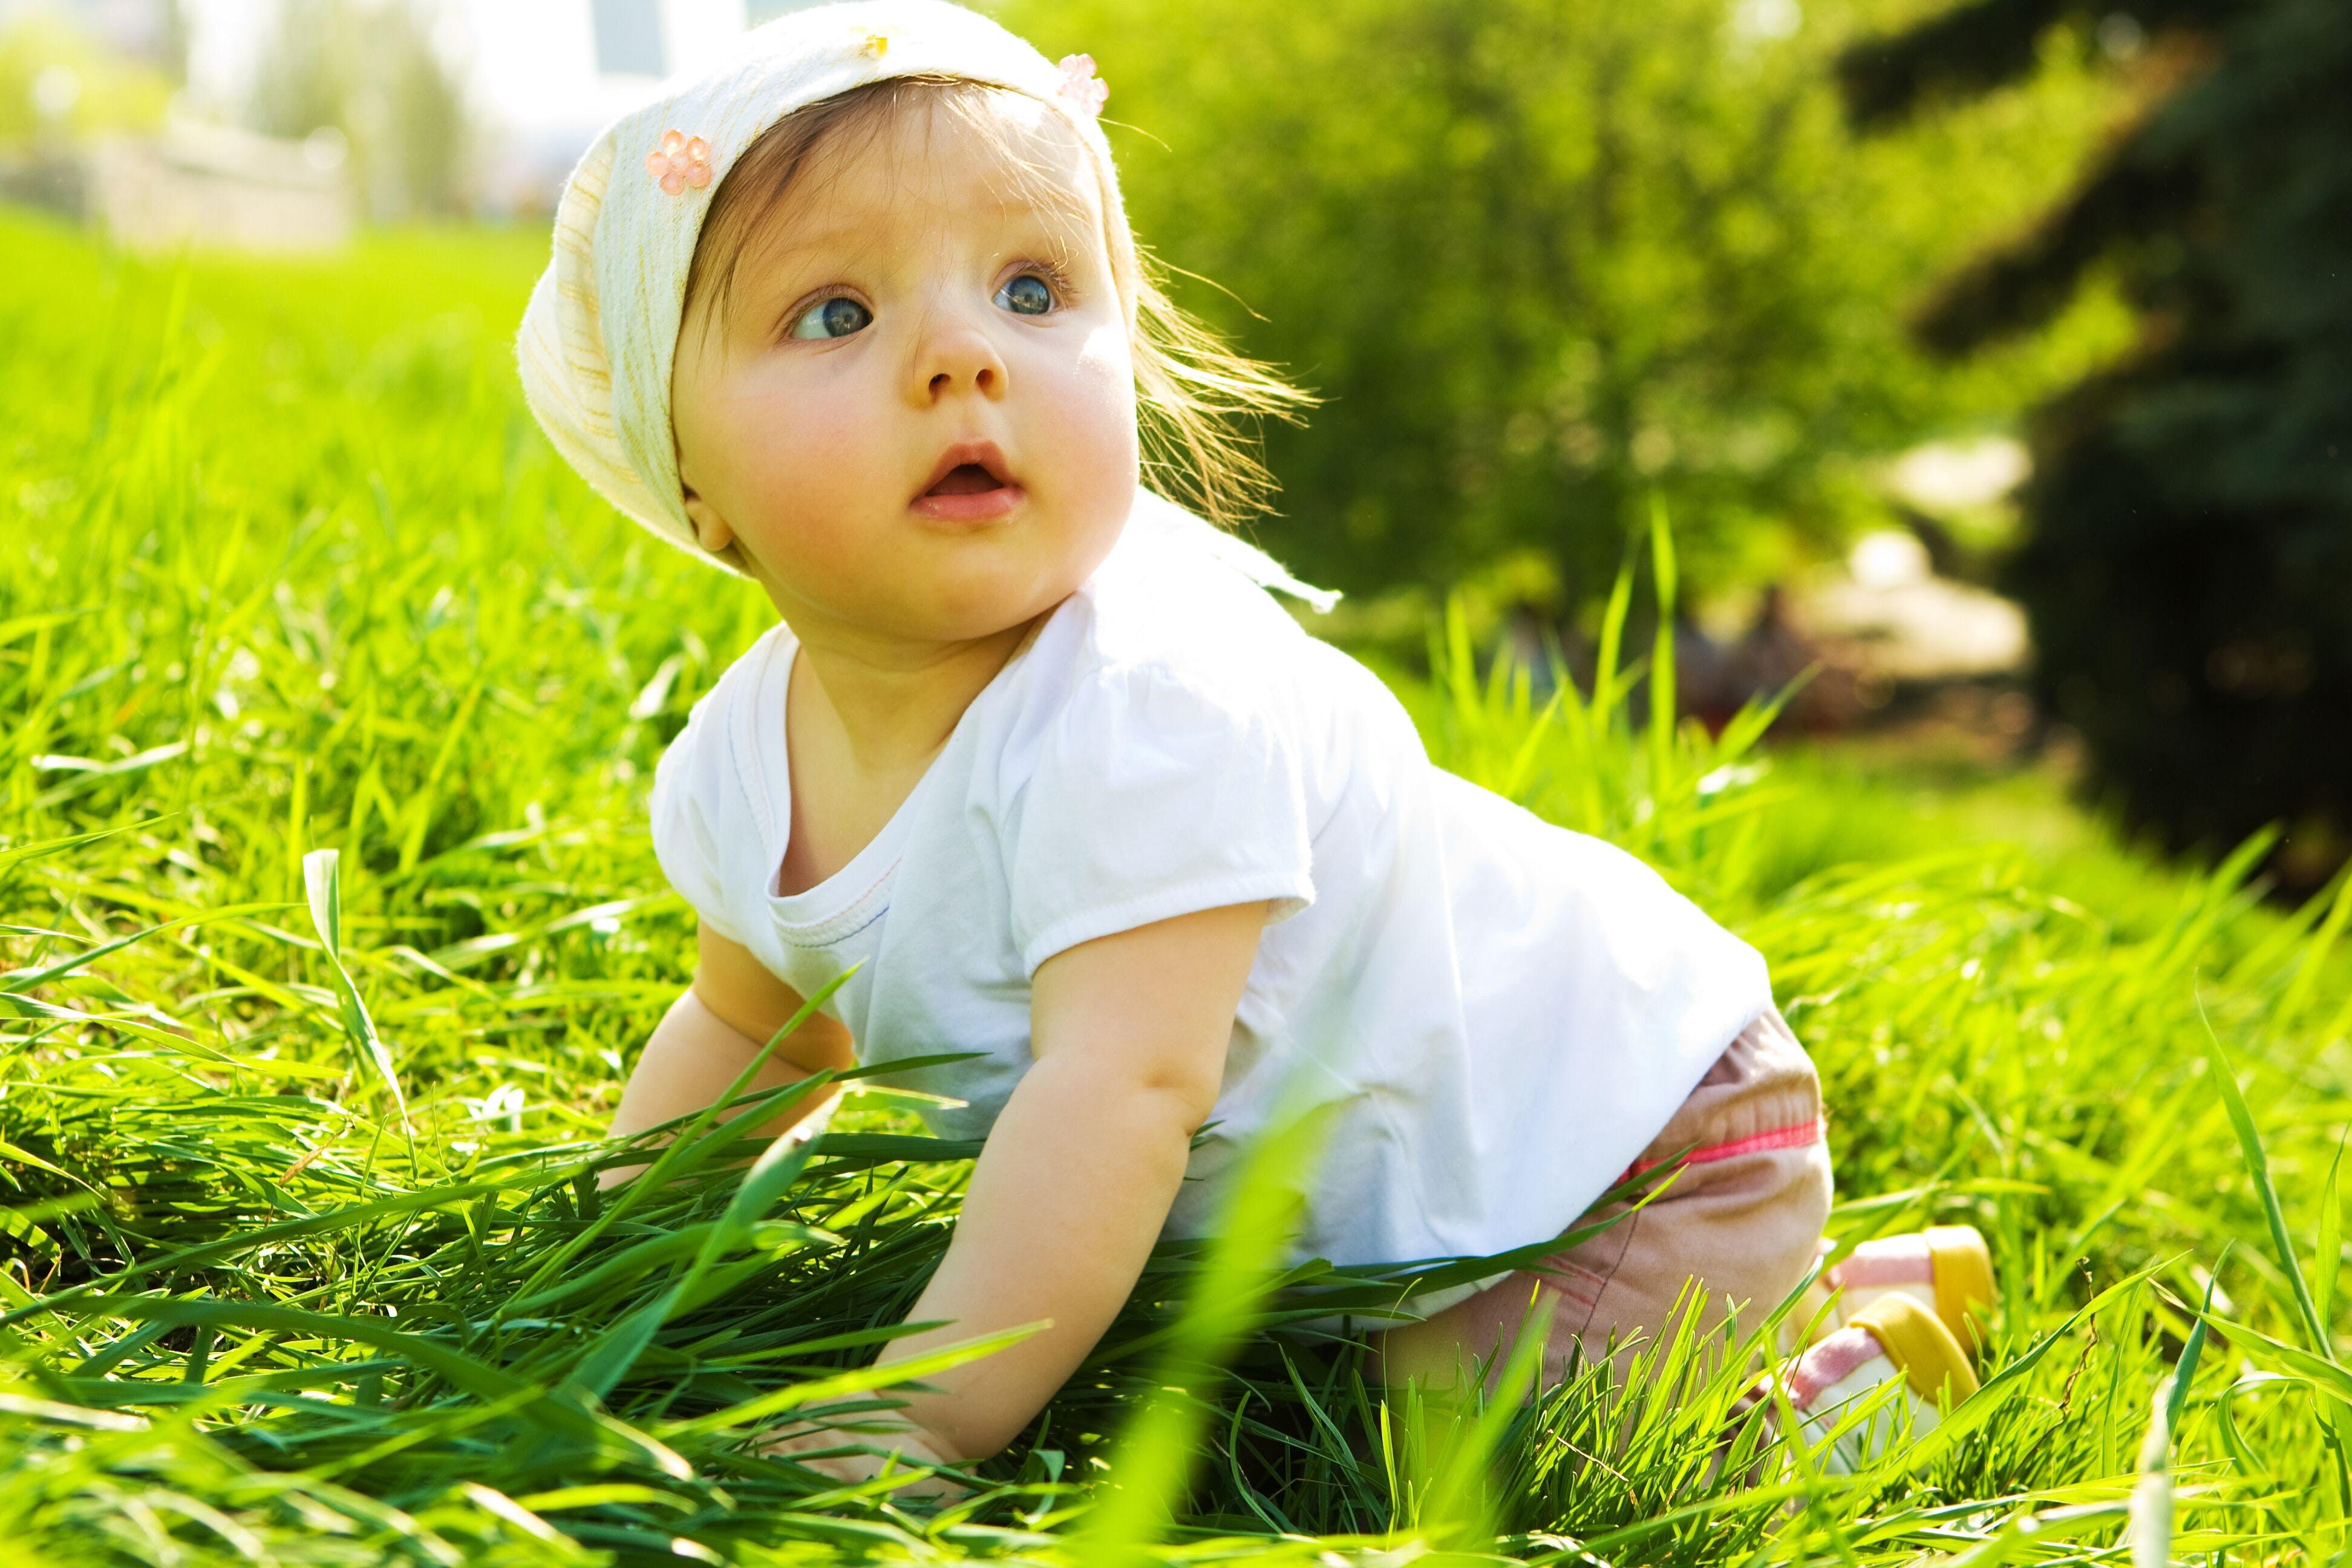 Bohemian baby girl.jpeg?ixlib=rails 3.0